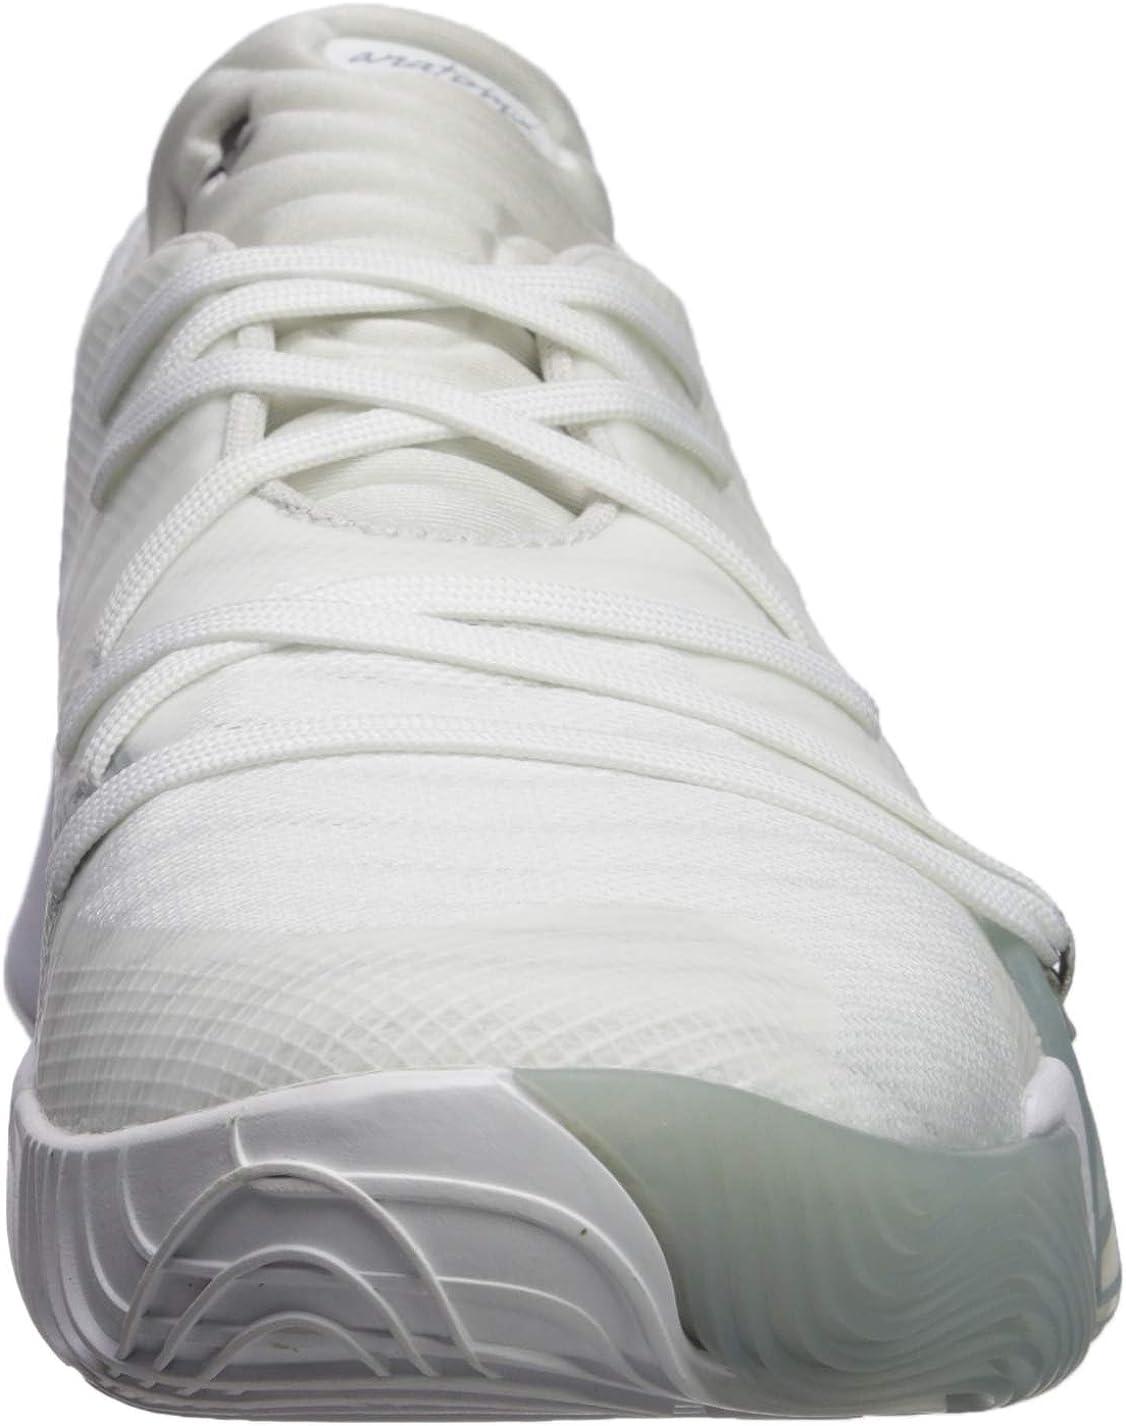 Zapatos de Baloncesto para Hombre Under Armour Spawn Low